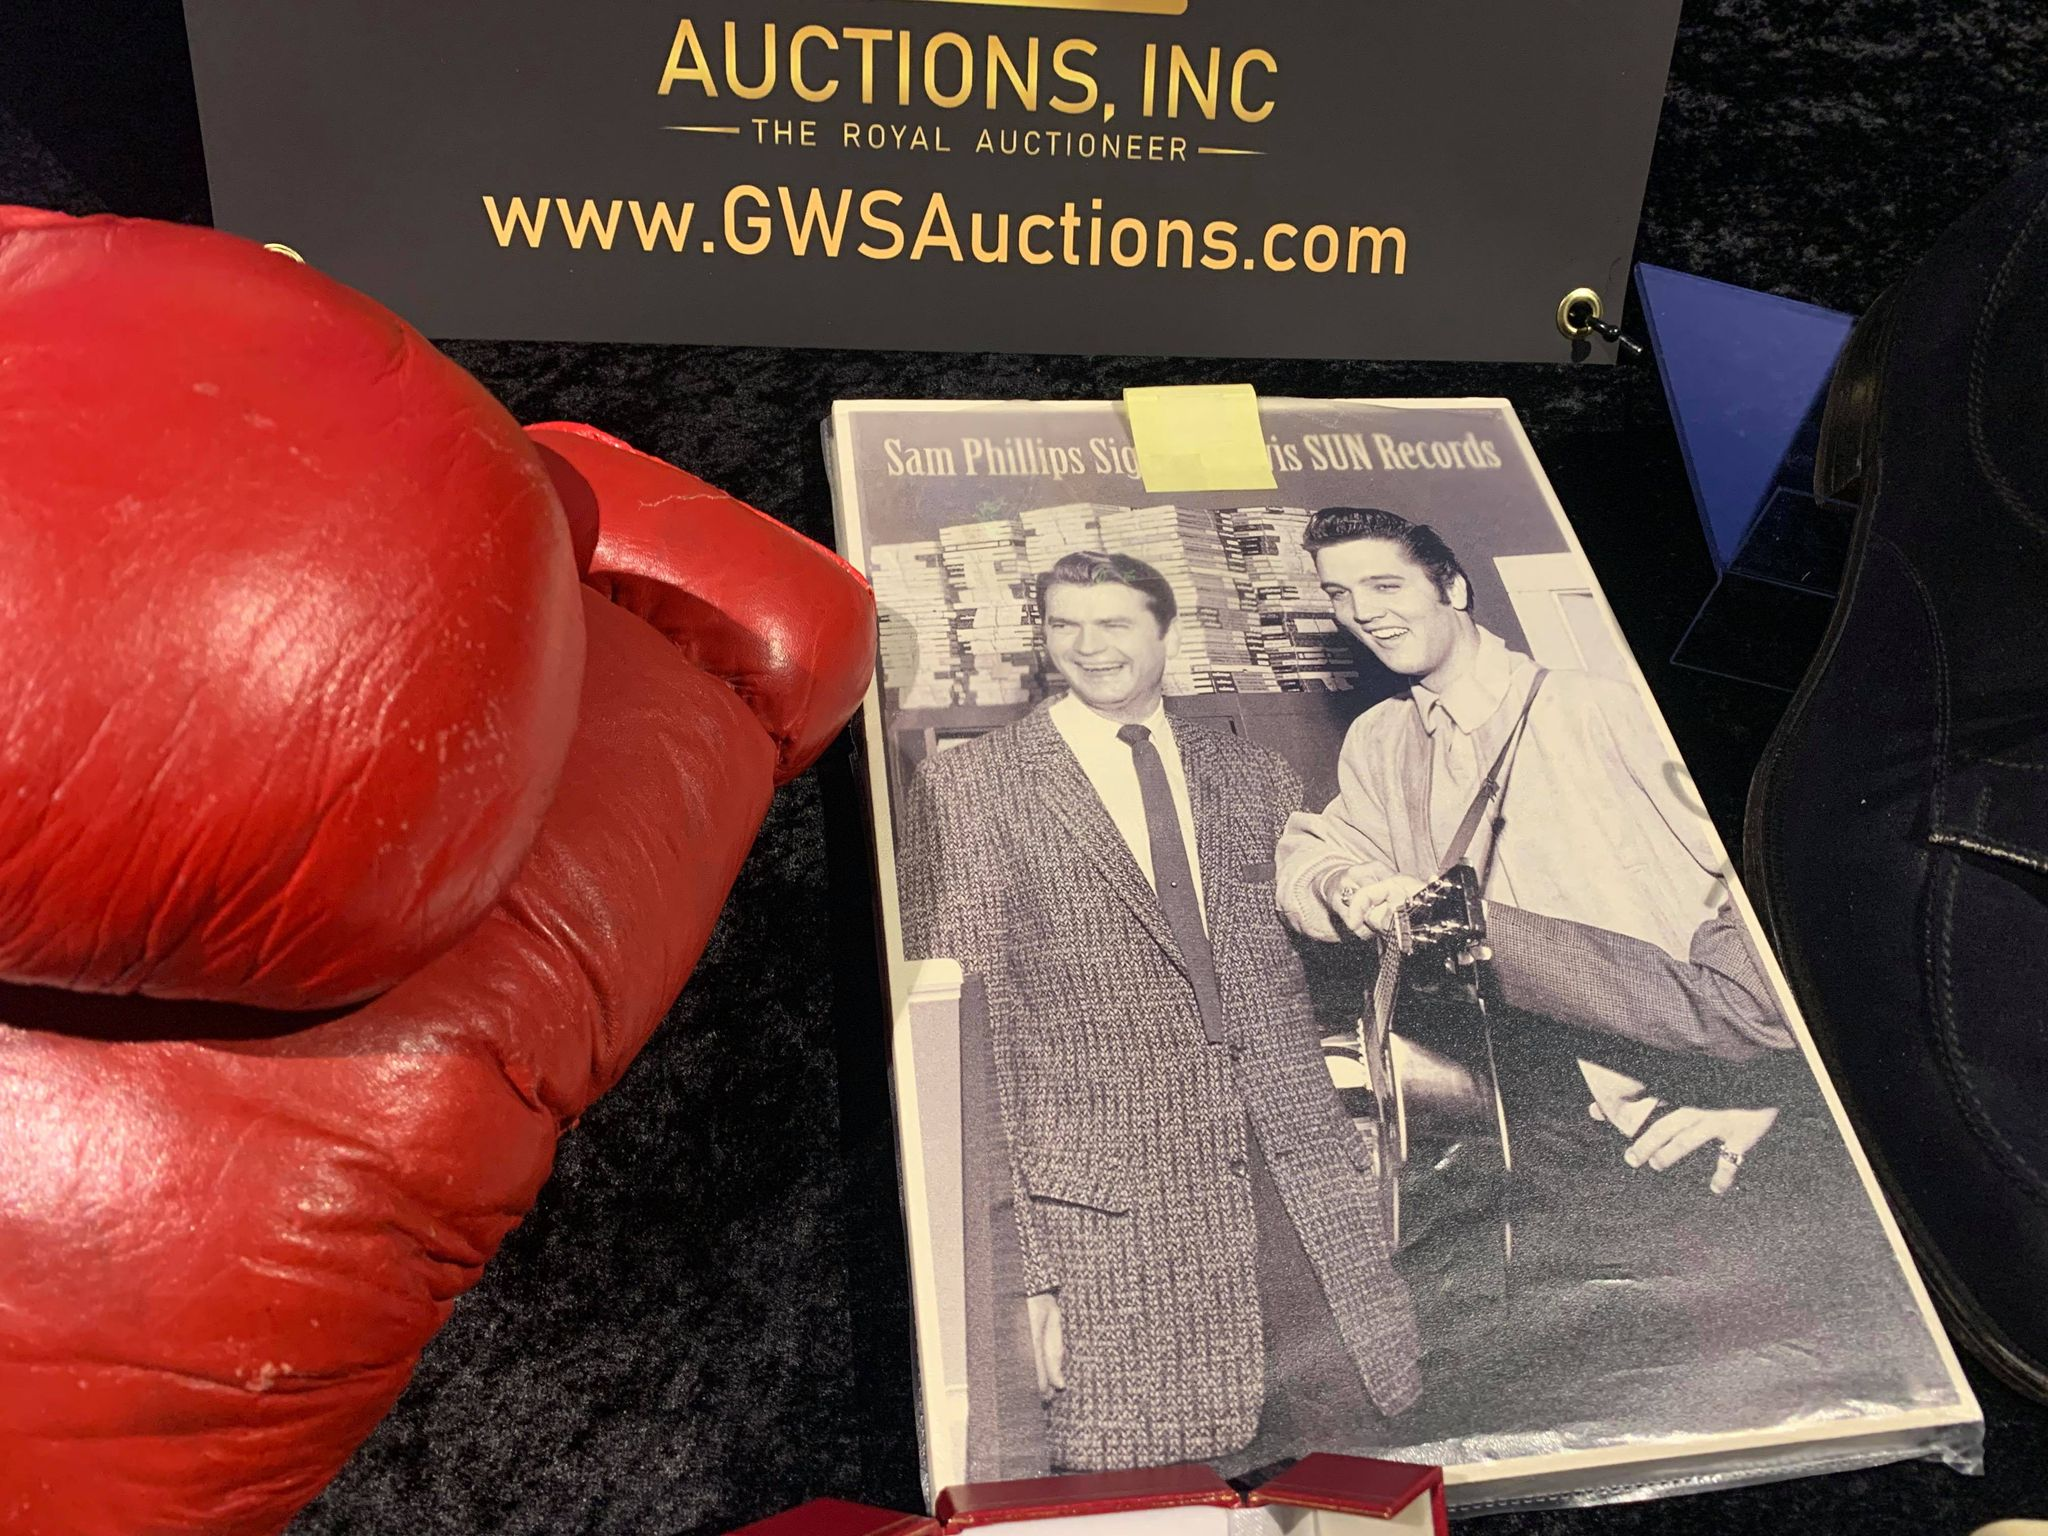 Kruse GWS Auctions